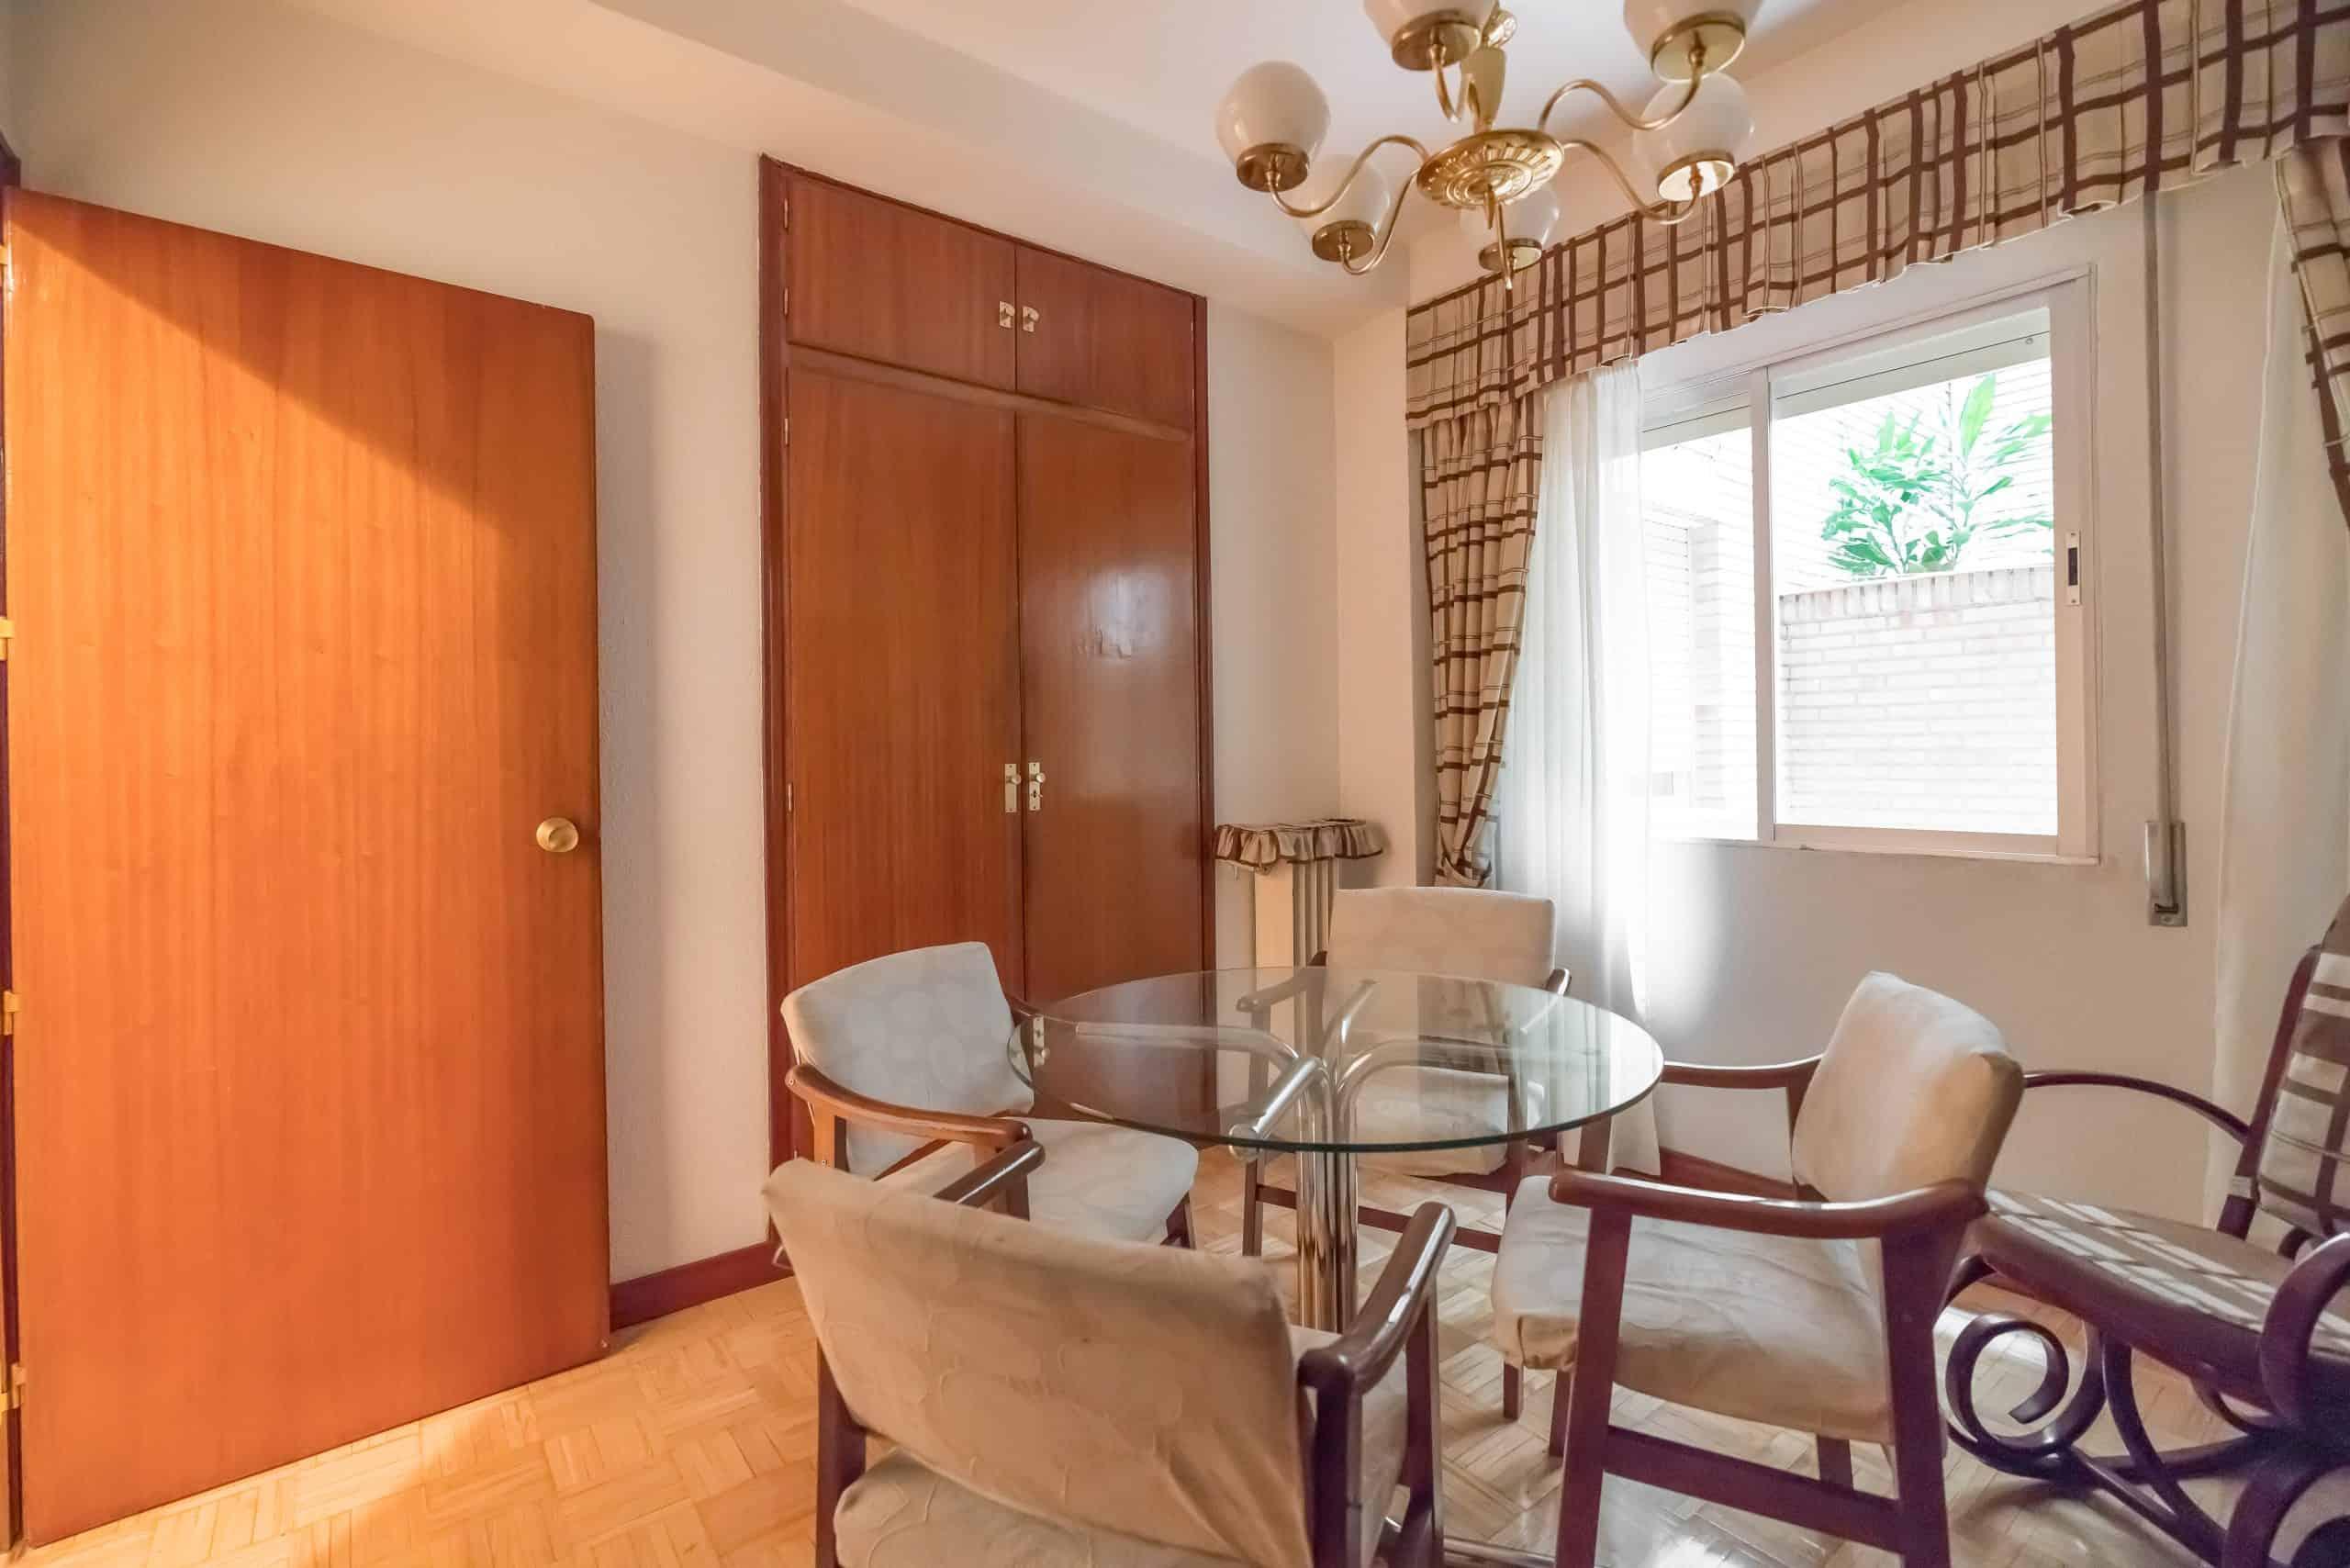 Agencia Inmobiliaria de Madrid-FUTUROCASA-Zona ARGANZUELA-EMBAJADORES-LEGAZPI -calle tomas borras- dormitorio-3